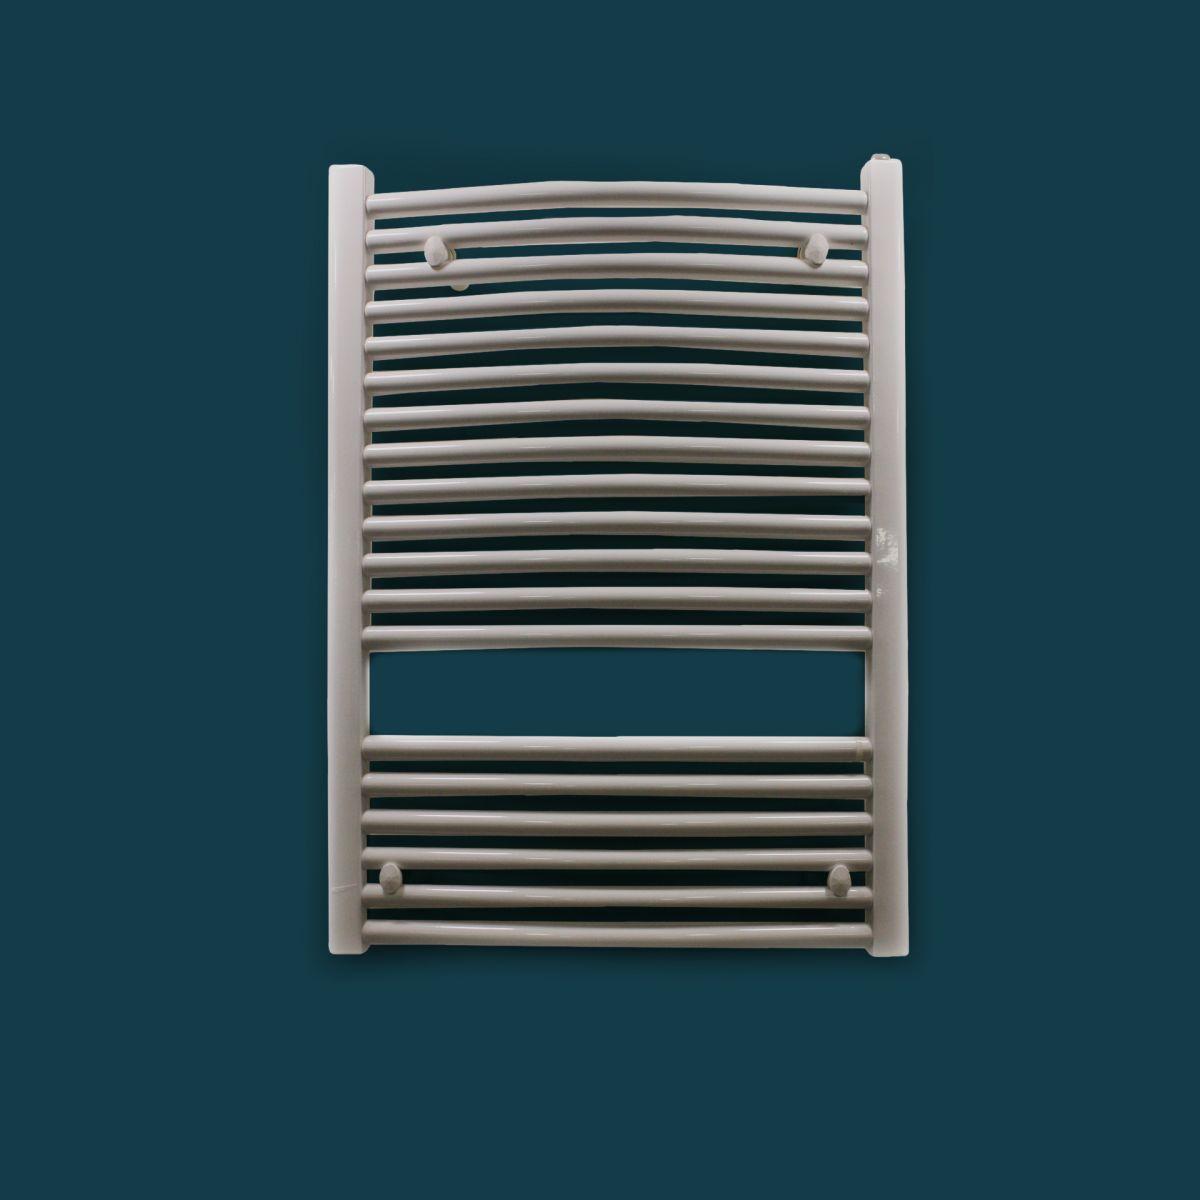 Termoarredo Mod Letta Curvo Termoarredo mod. Letta curvo 60×80 cm interasse 55 finitura bianca